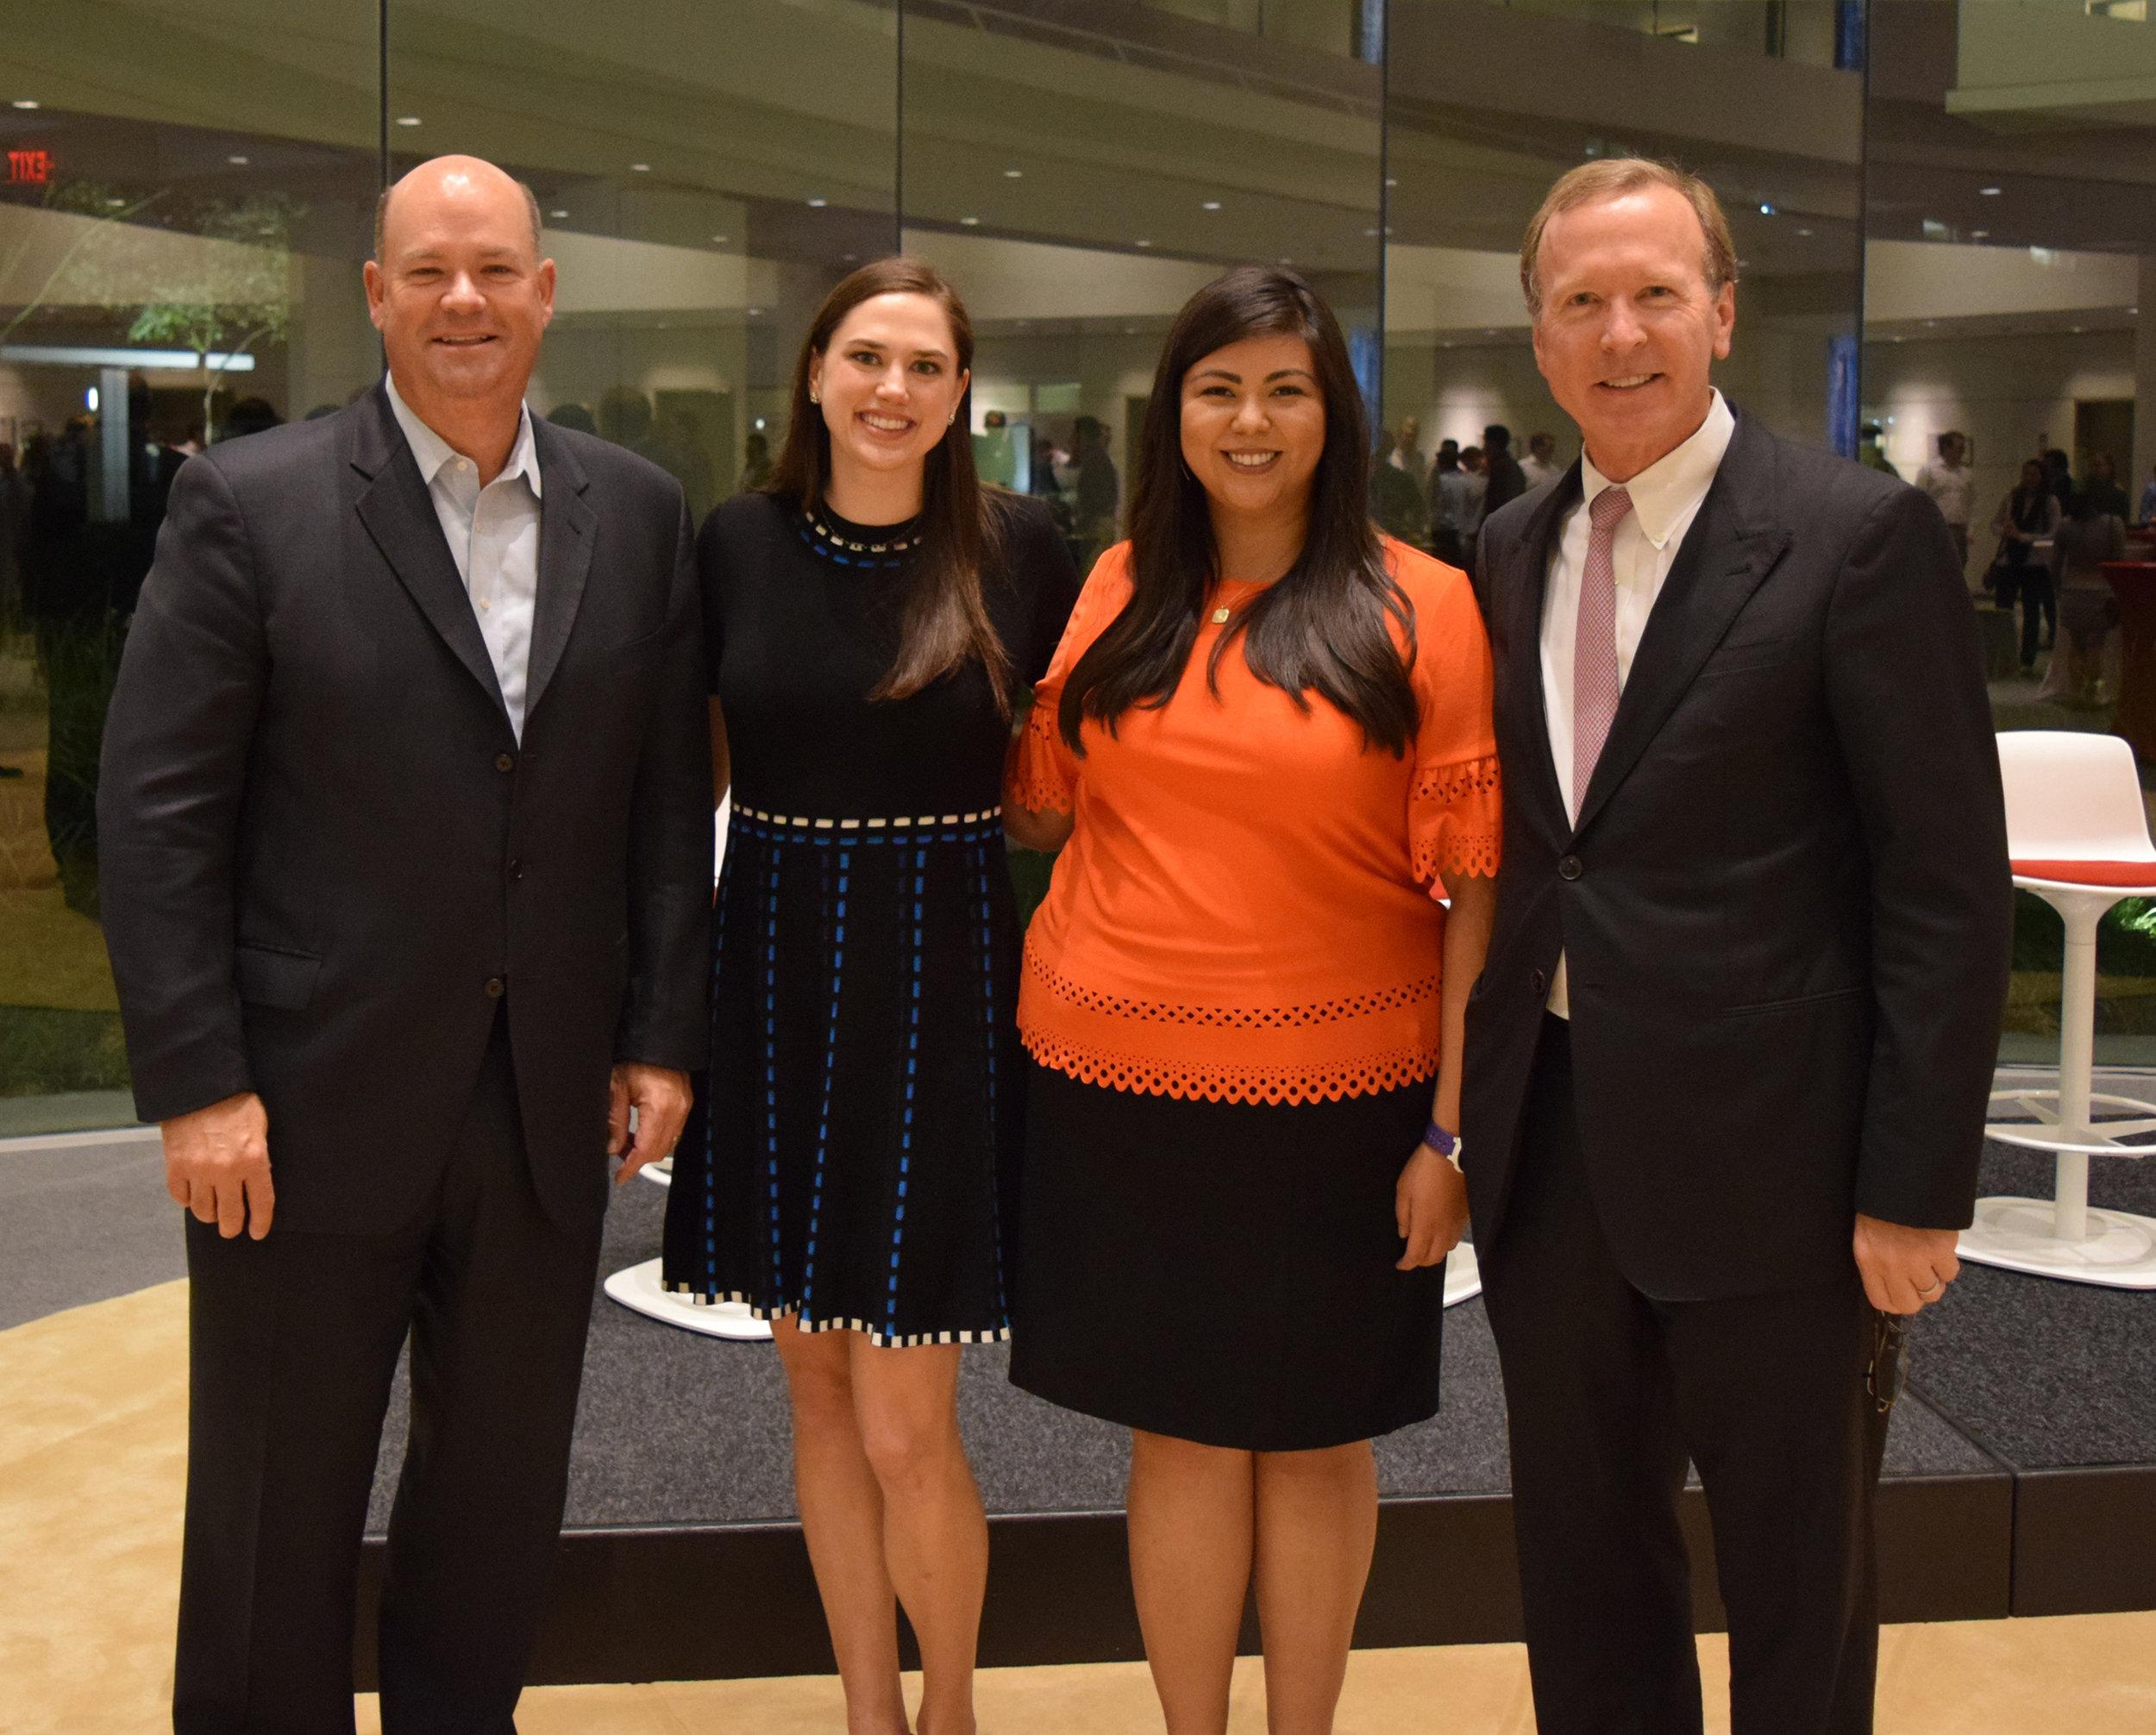 From left: ConocoPhillips CEO Ryan Lance, Regan Dittmar, Victoria Villarreal, and Foundation Chairman Neil Bush.